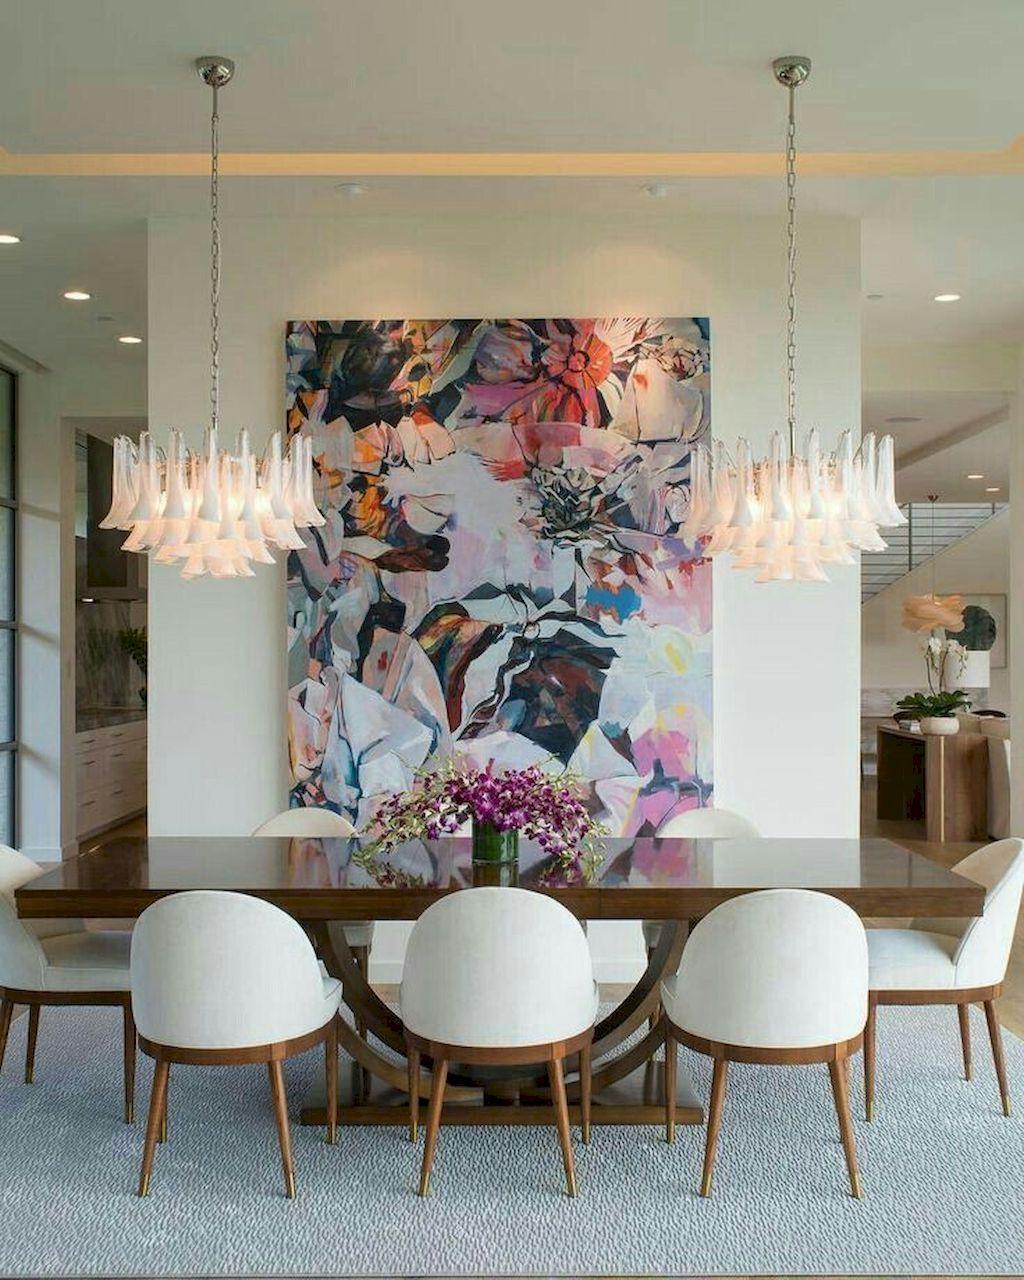 60 Modern Dining Room Design Ideas: 60 Gorgeous Mid Century Modern Living Room Design Ideas